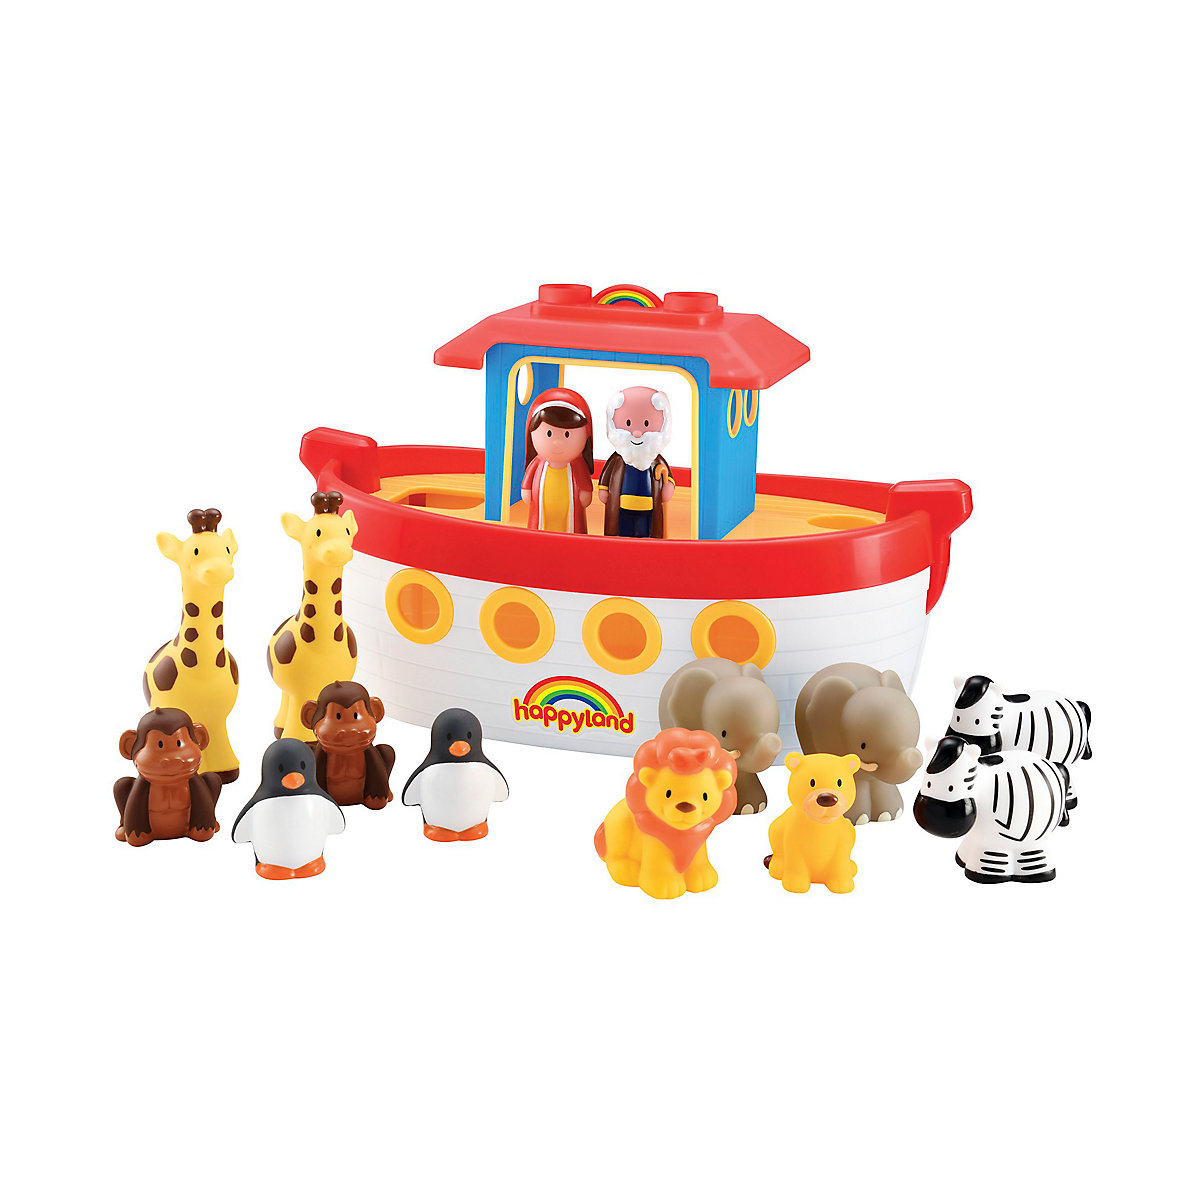 Happyland Noahs Ark